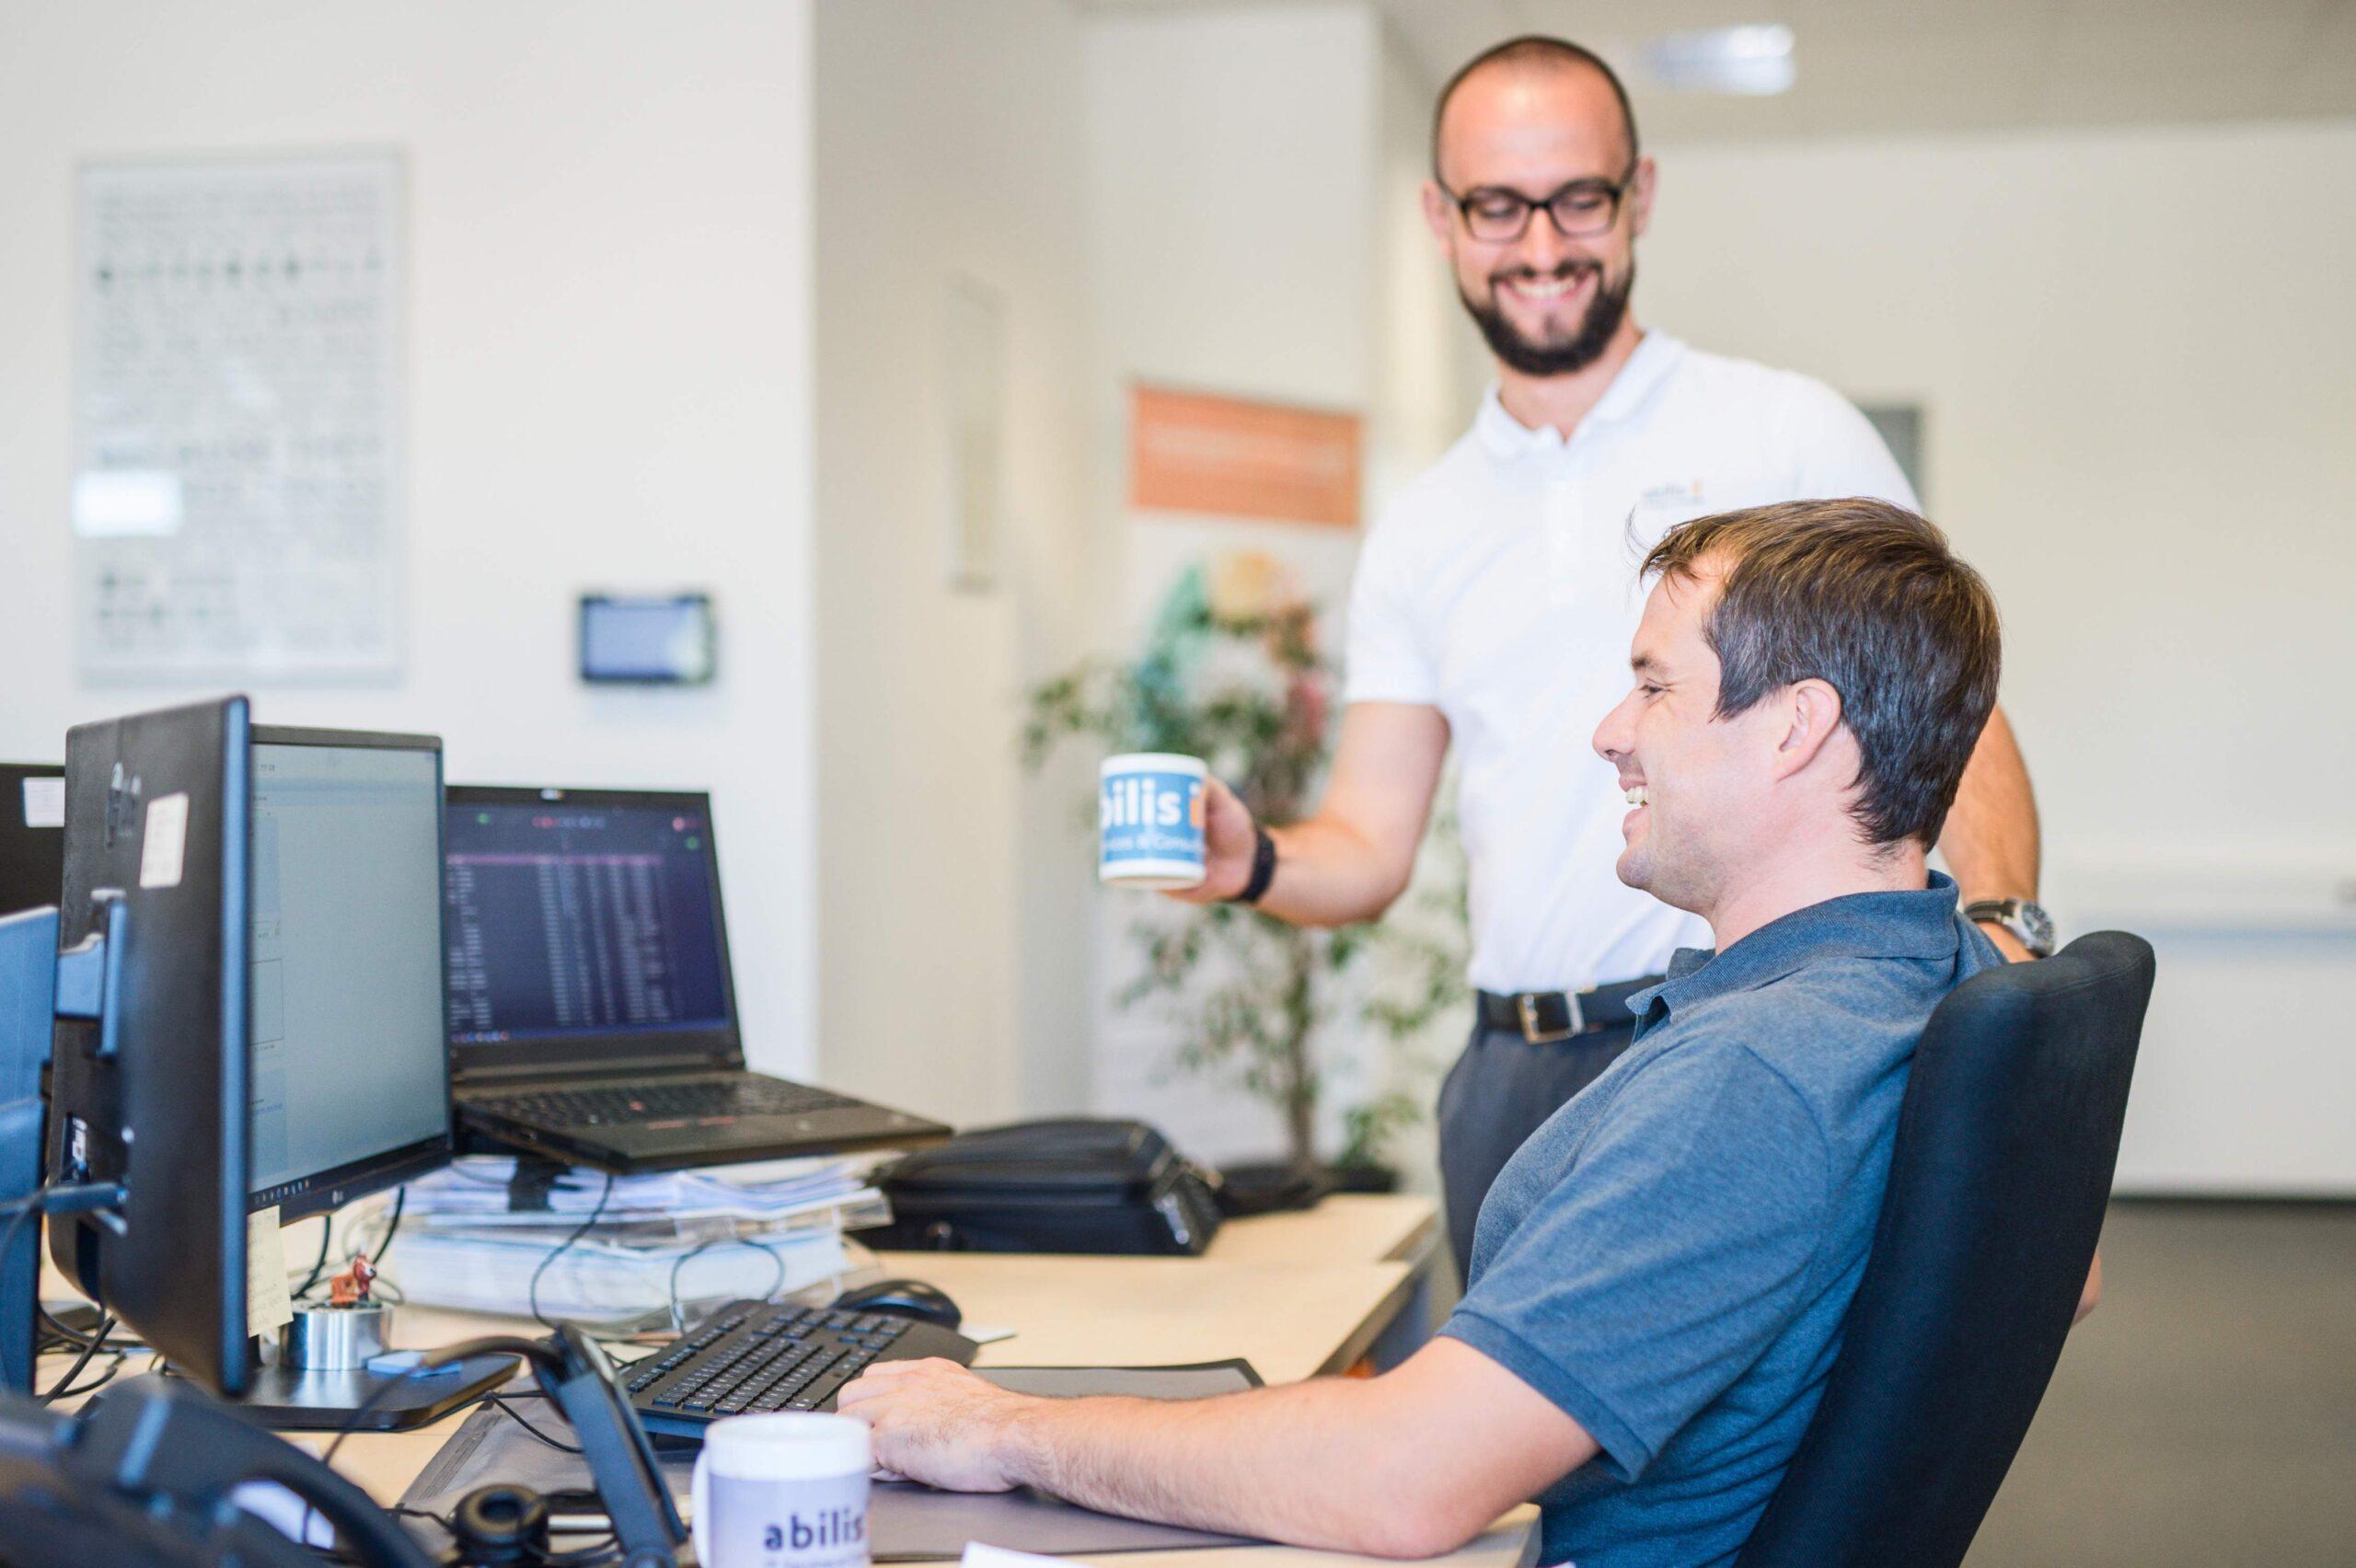 Personalwesen in SAP: SFSF oder SAP HCM